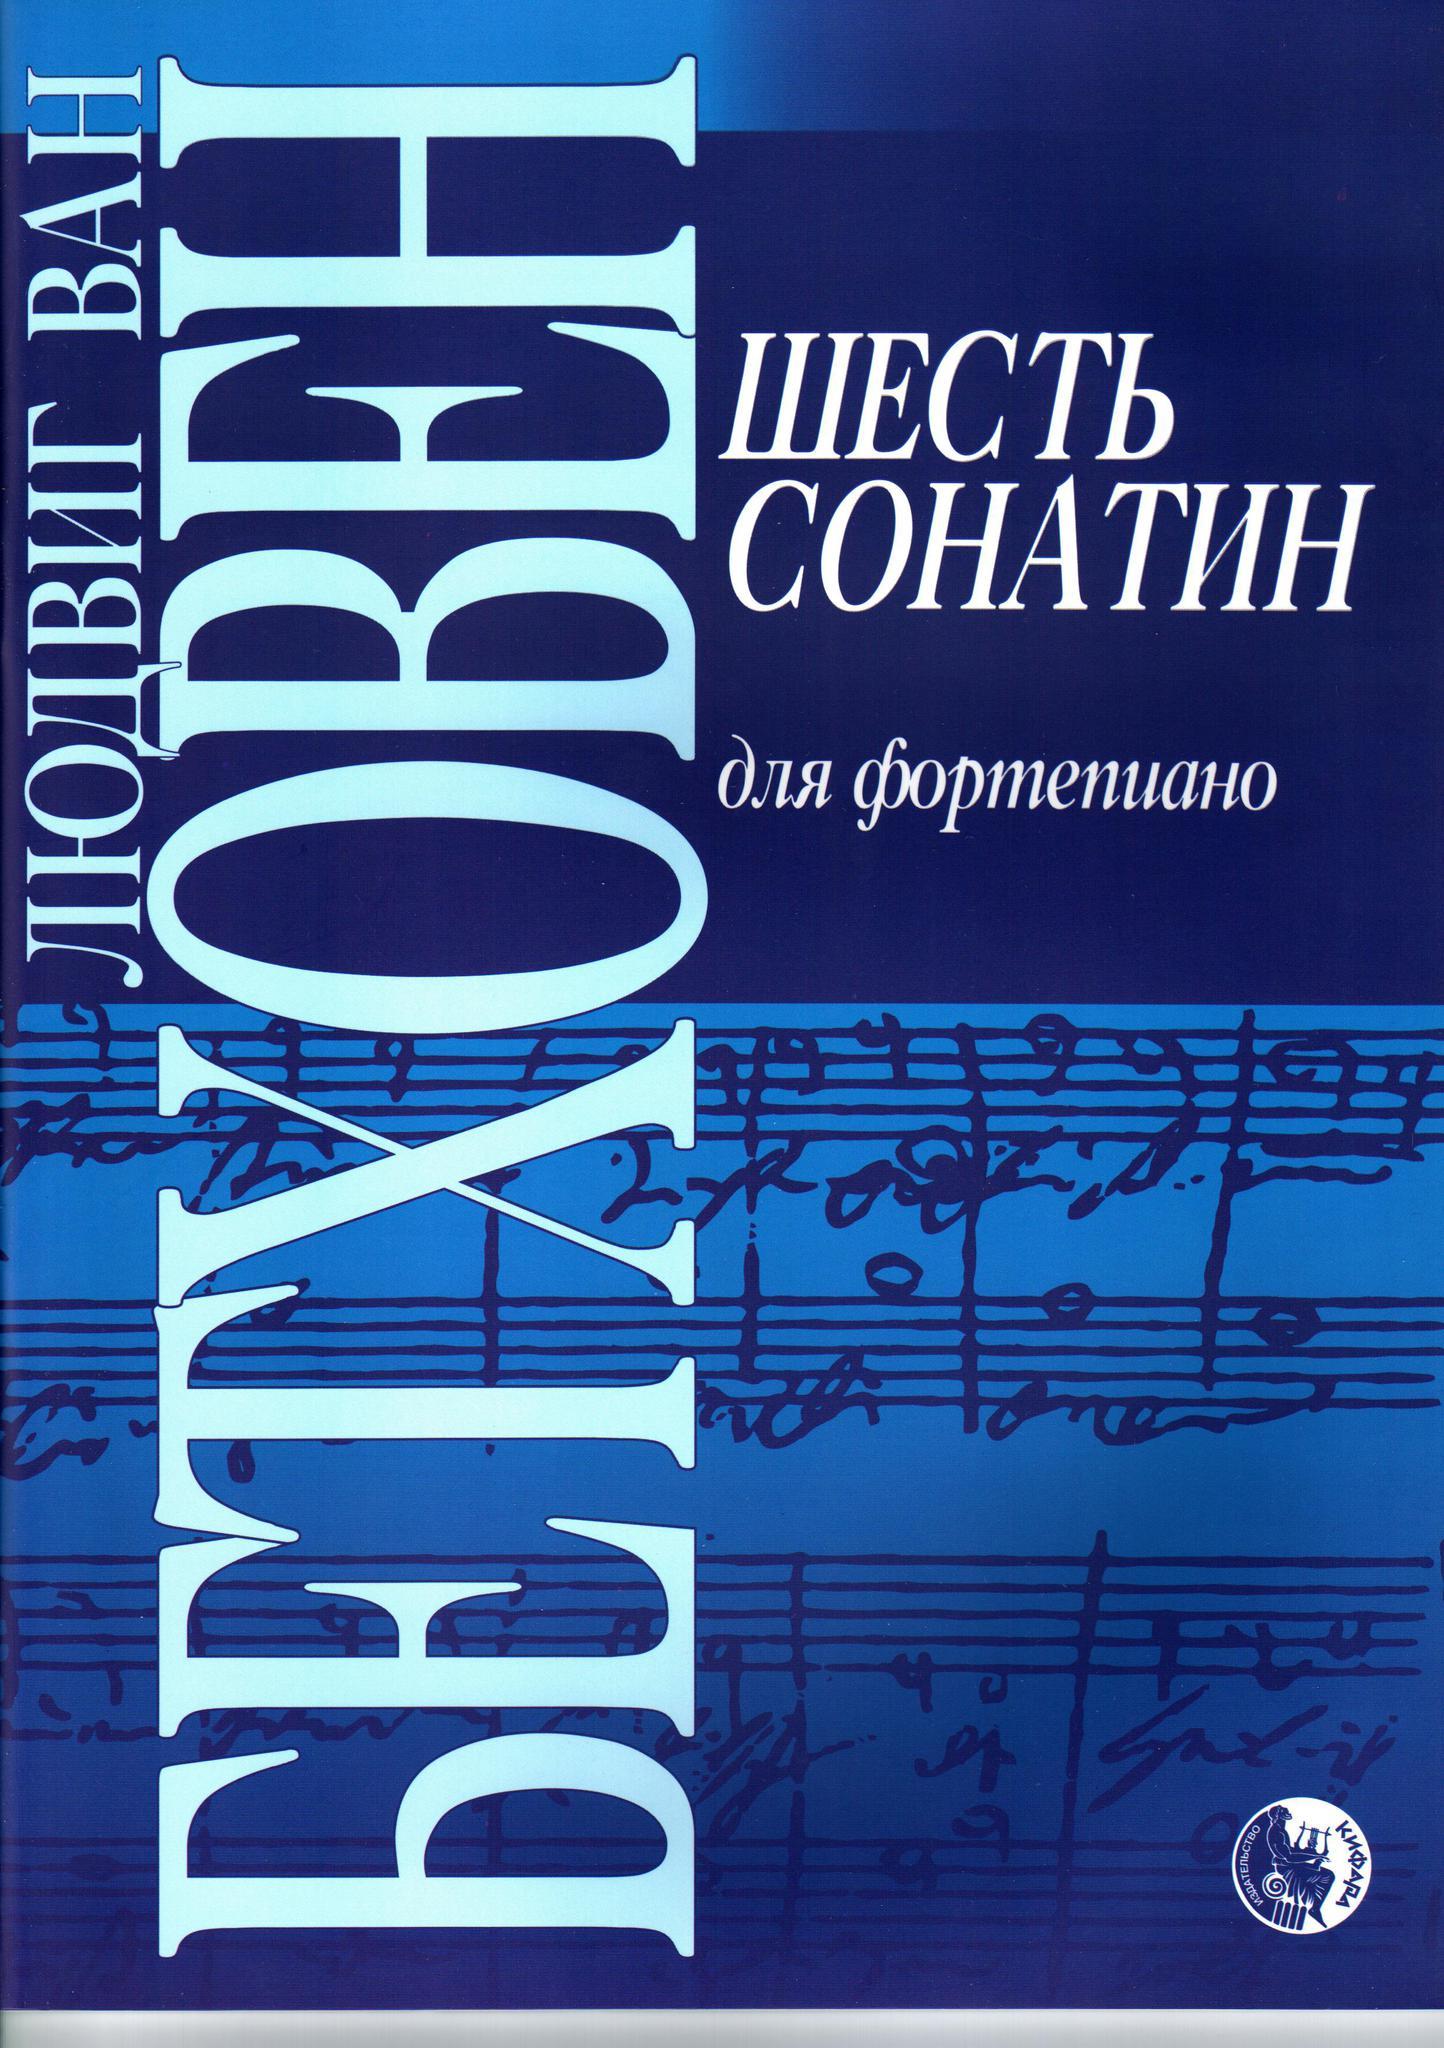 Бетховен л. Шесть сонатин